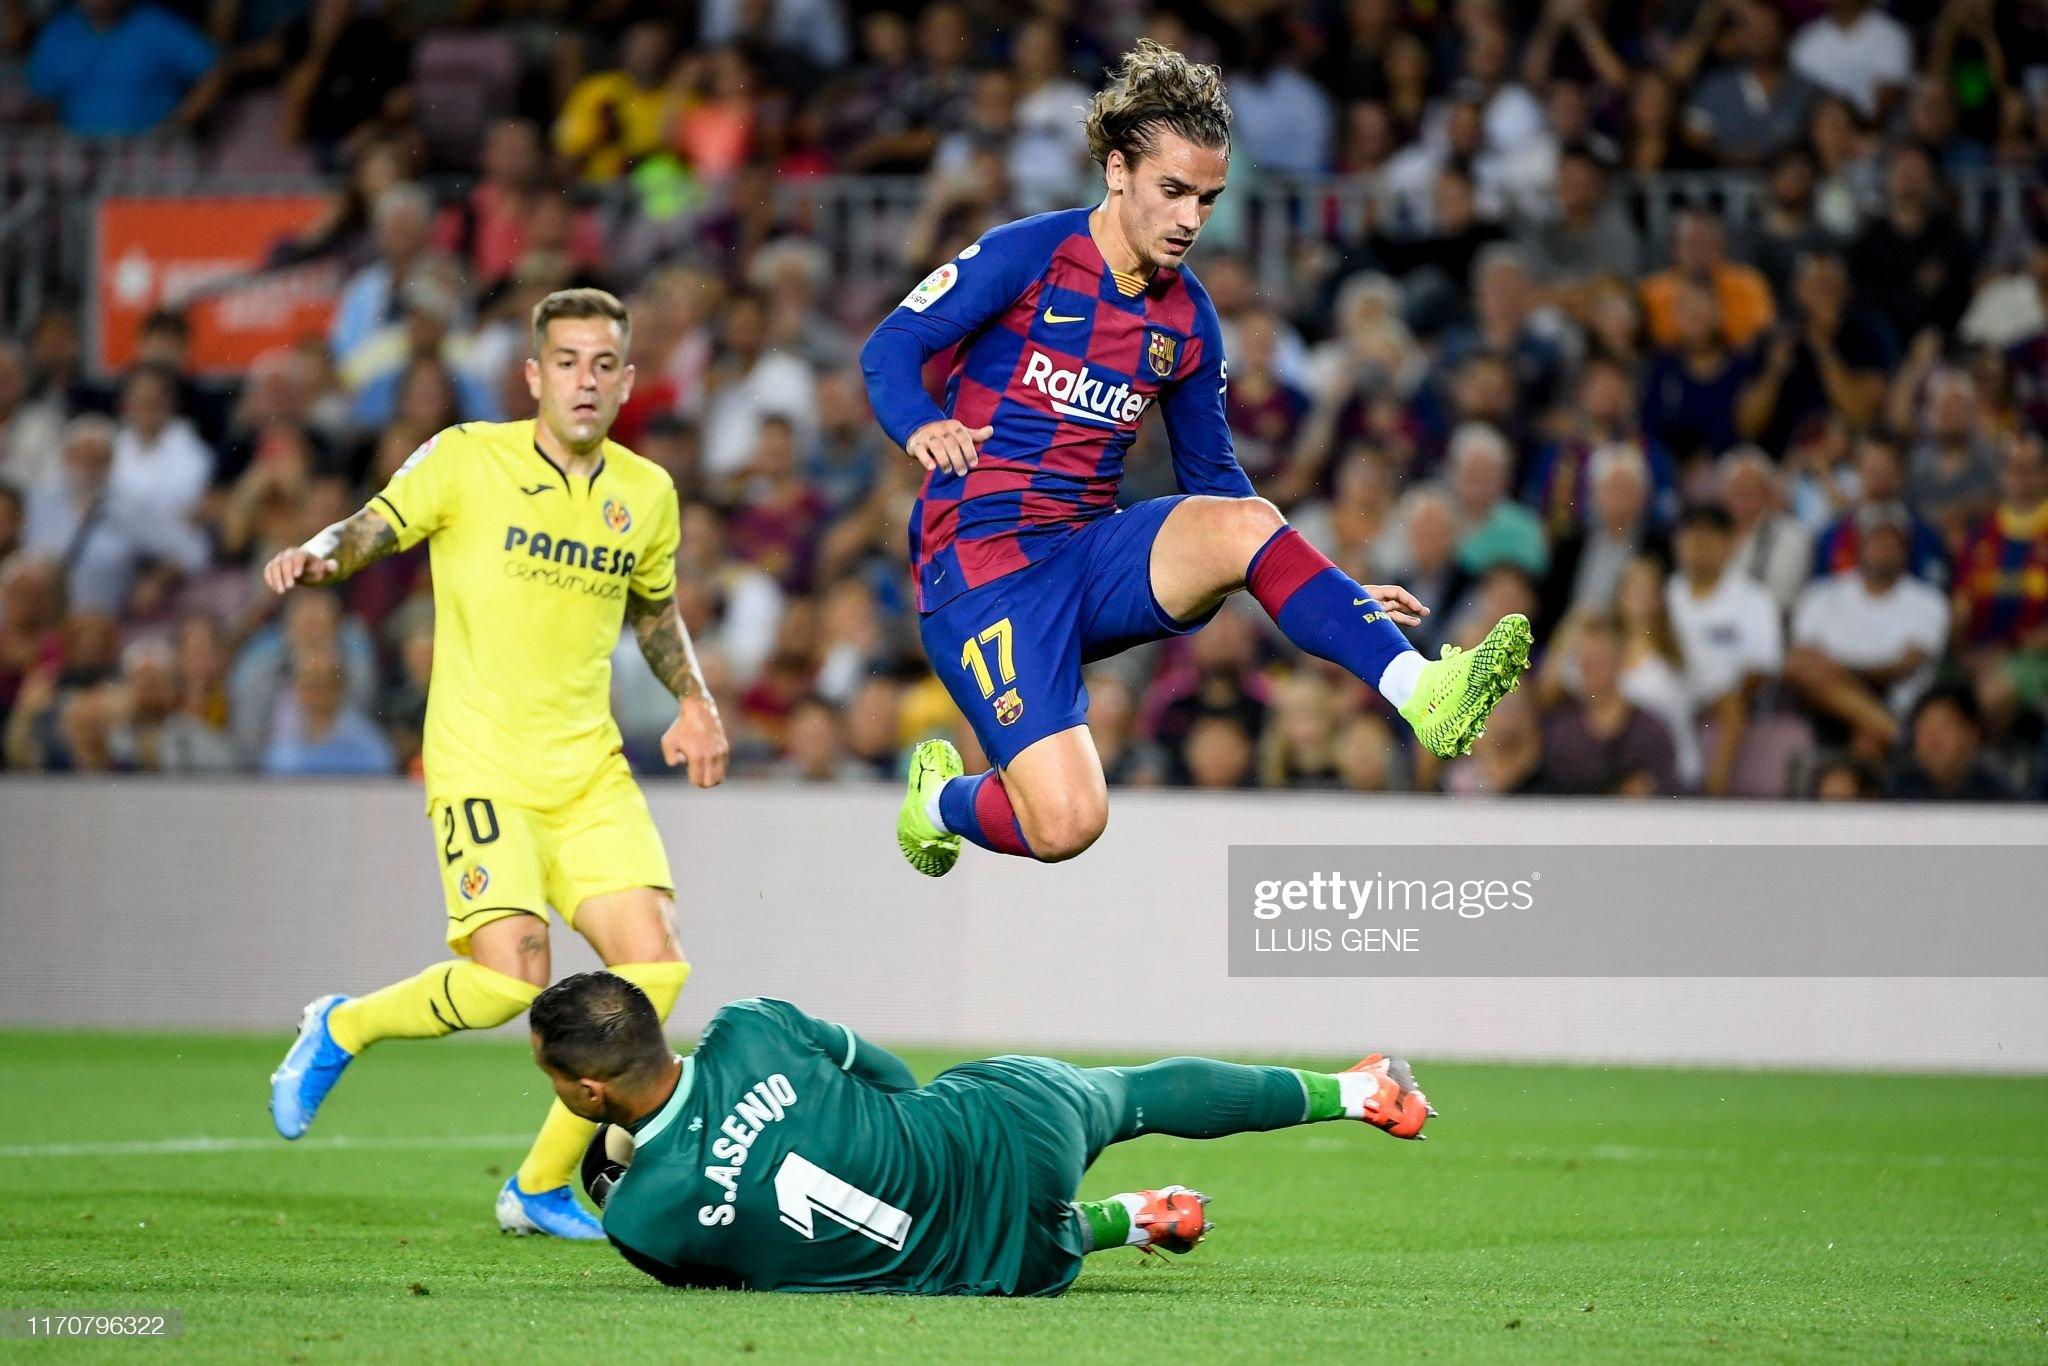 صور مباراة : برشلونة - فياريال 2-1 ( 24-09-2019 )  Barcelonas-french-forward-antoine-griezmann-jumps-over-villarreals-picture-id1170796322?s=2048x2048